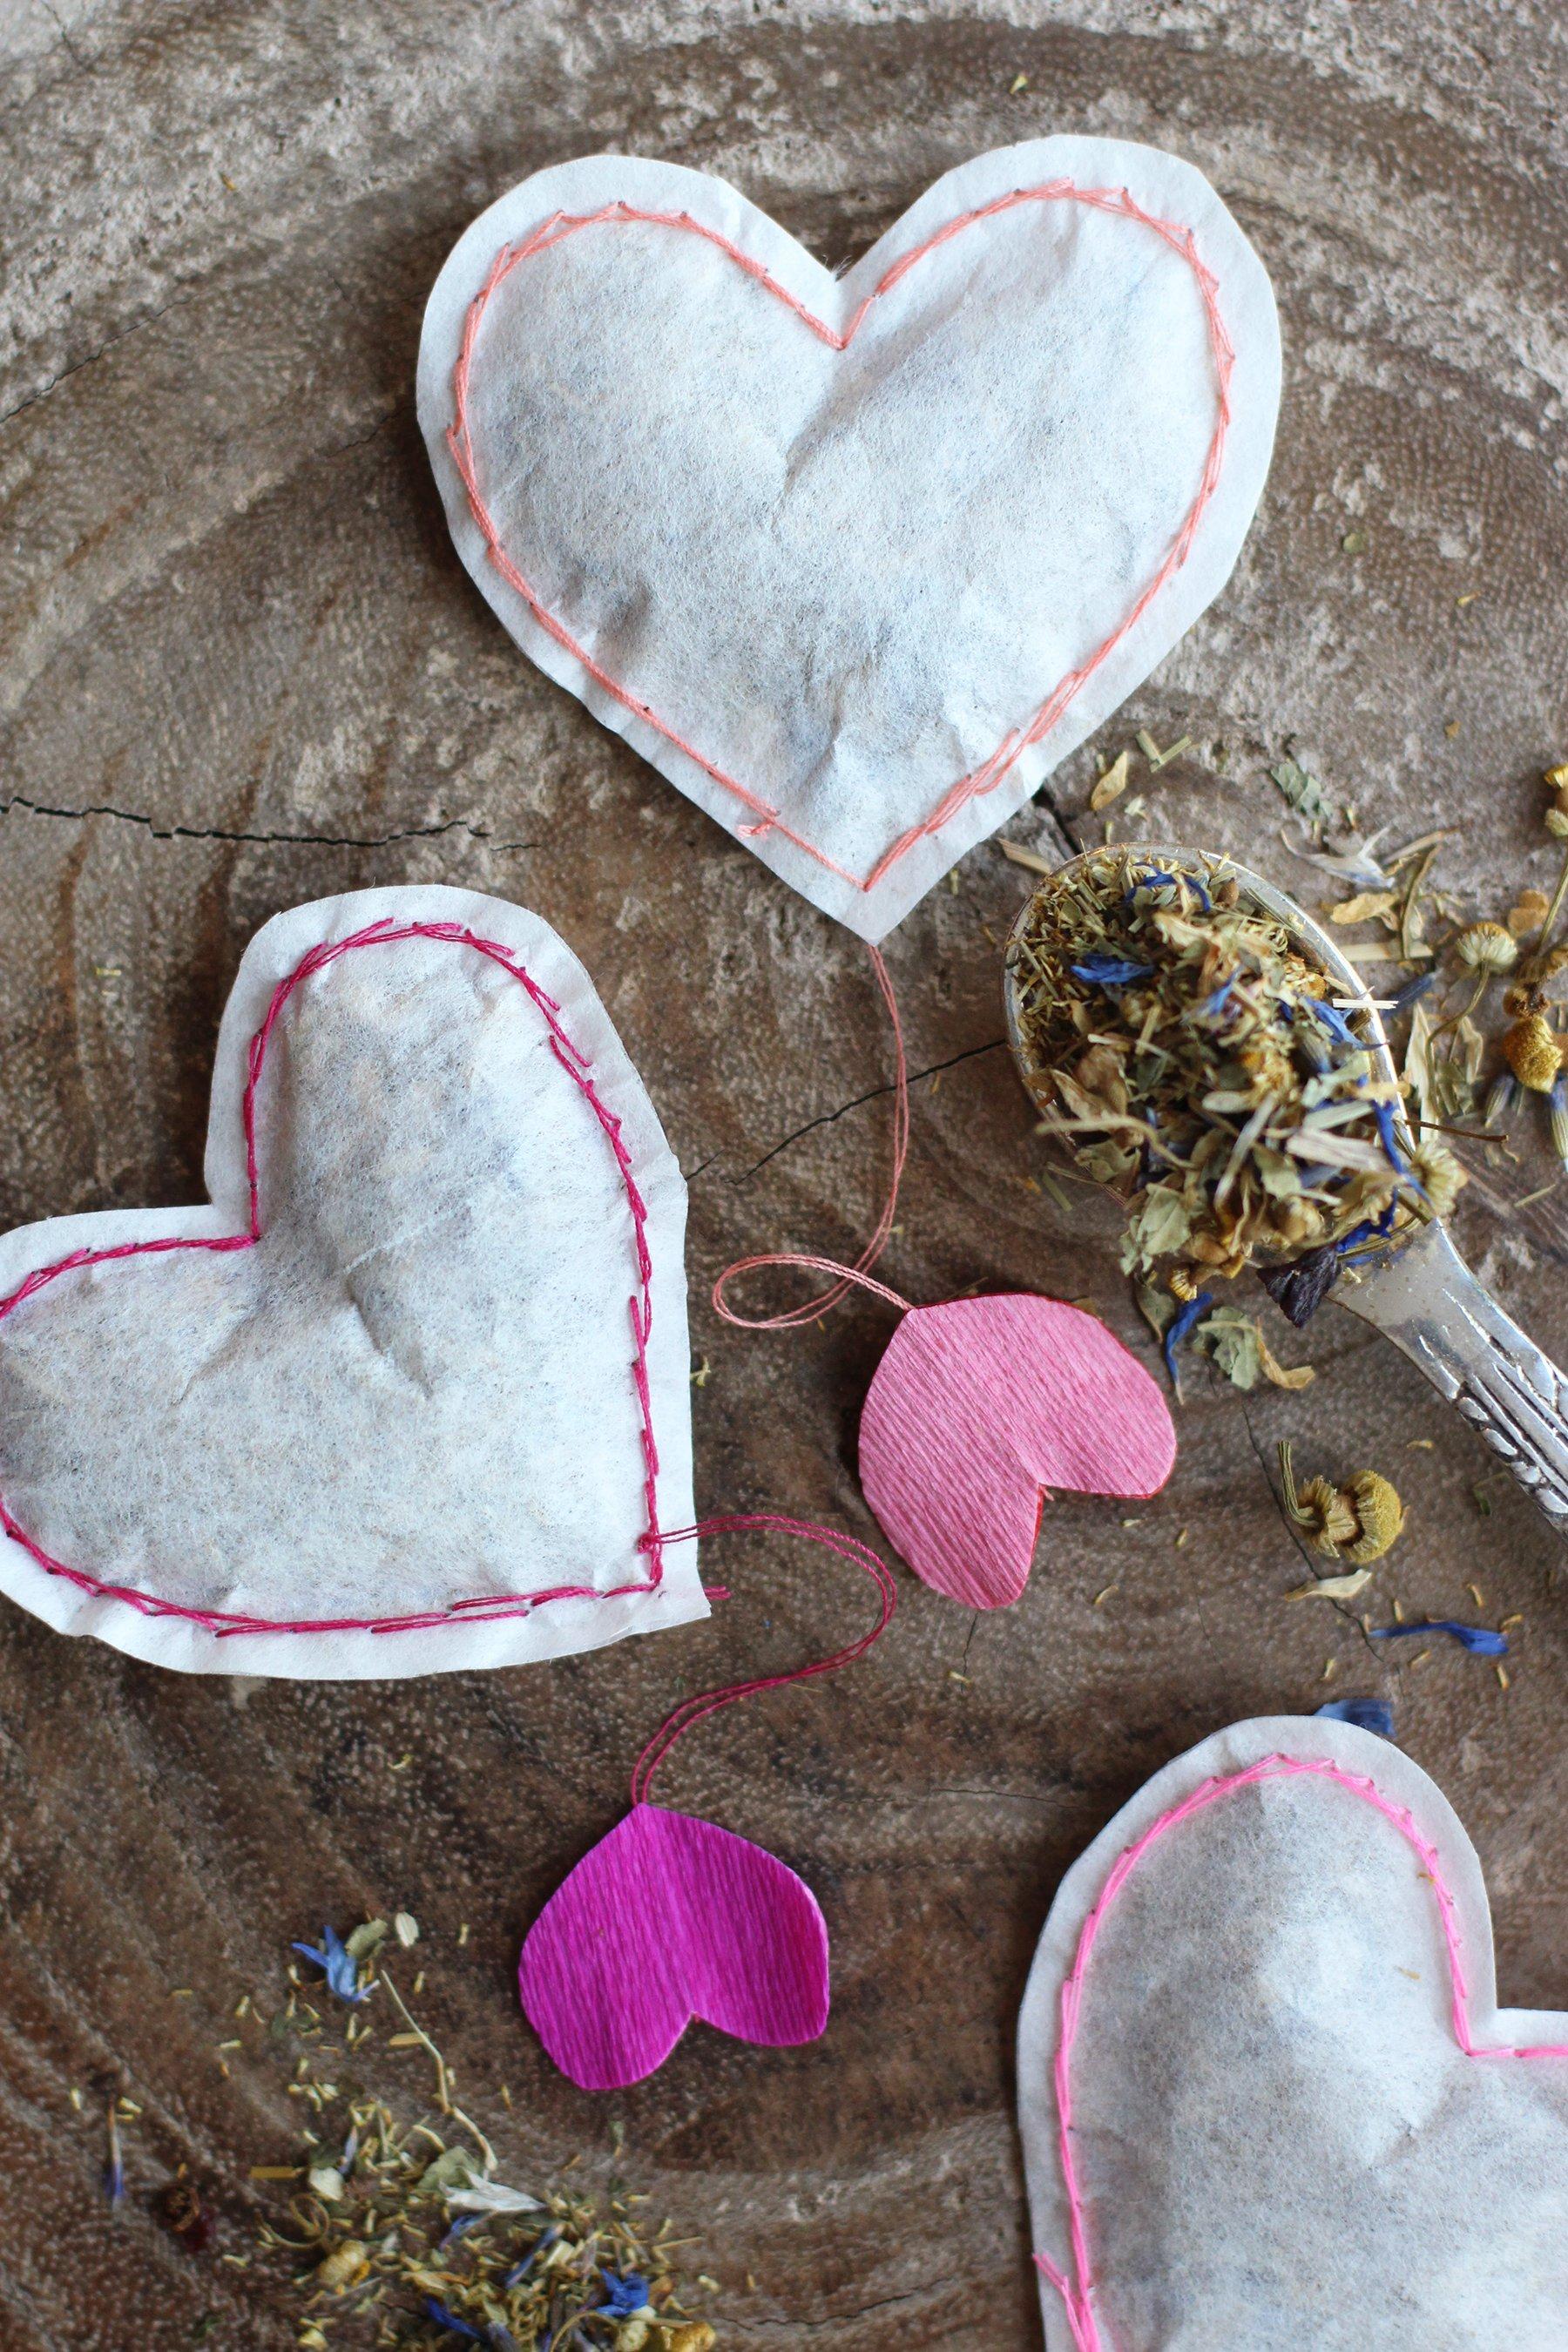 DIY Heart Shaped Tea Bags - HonestlyYUM